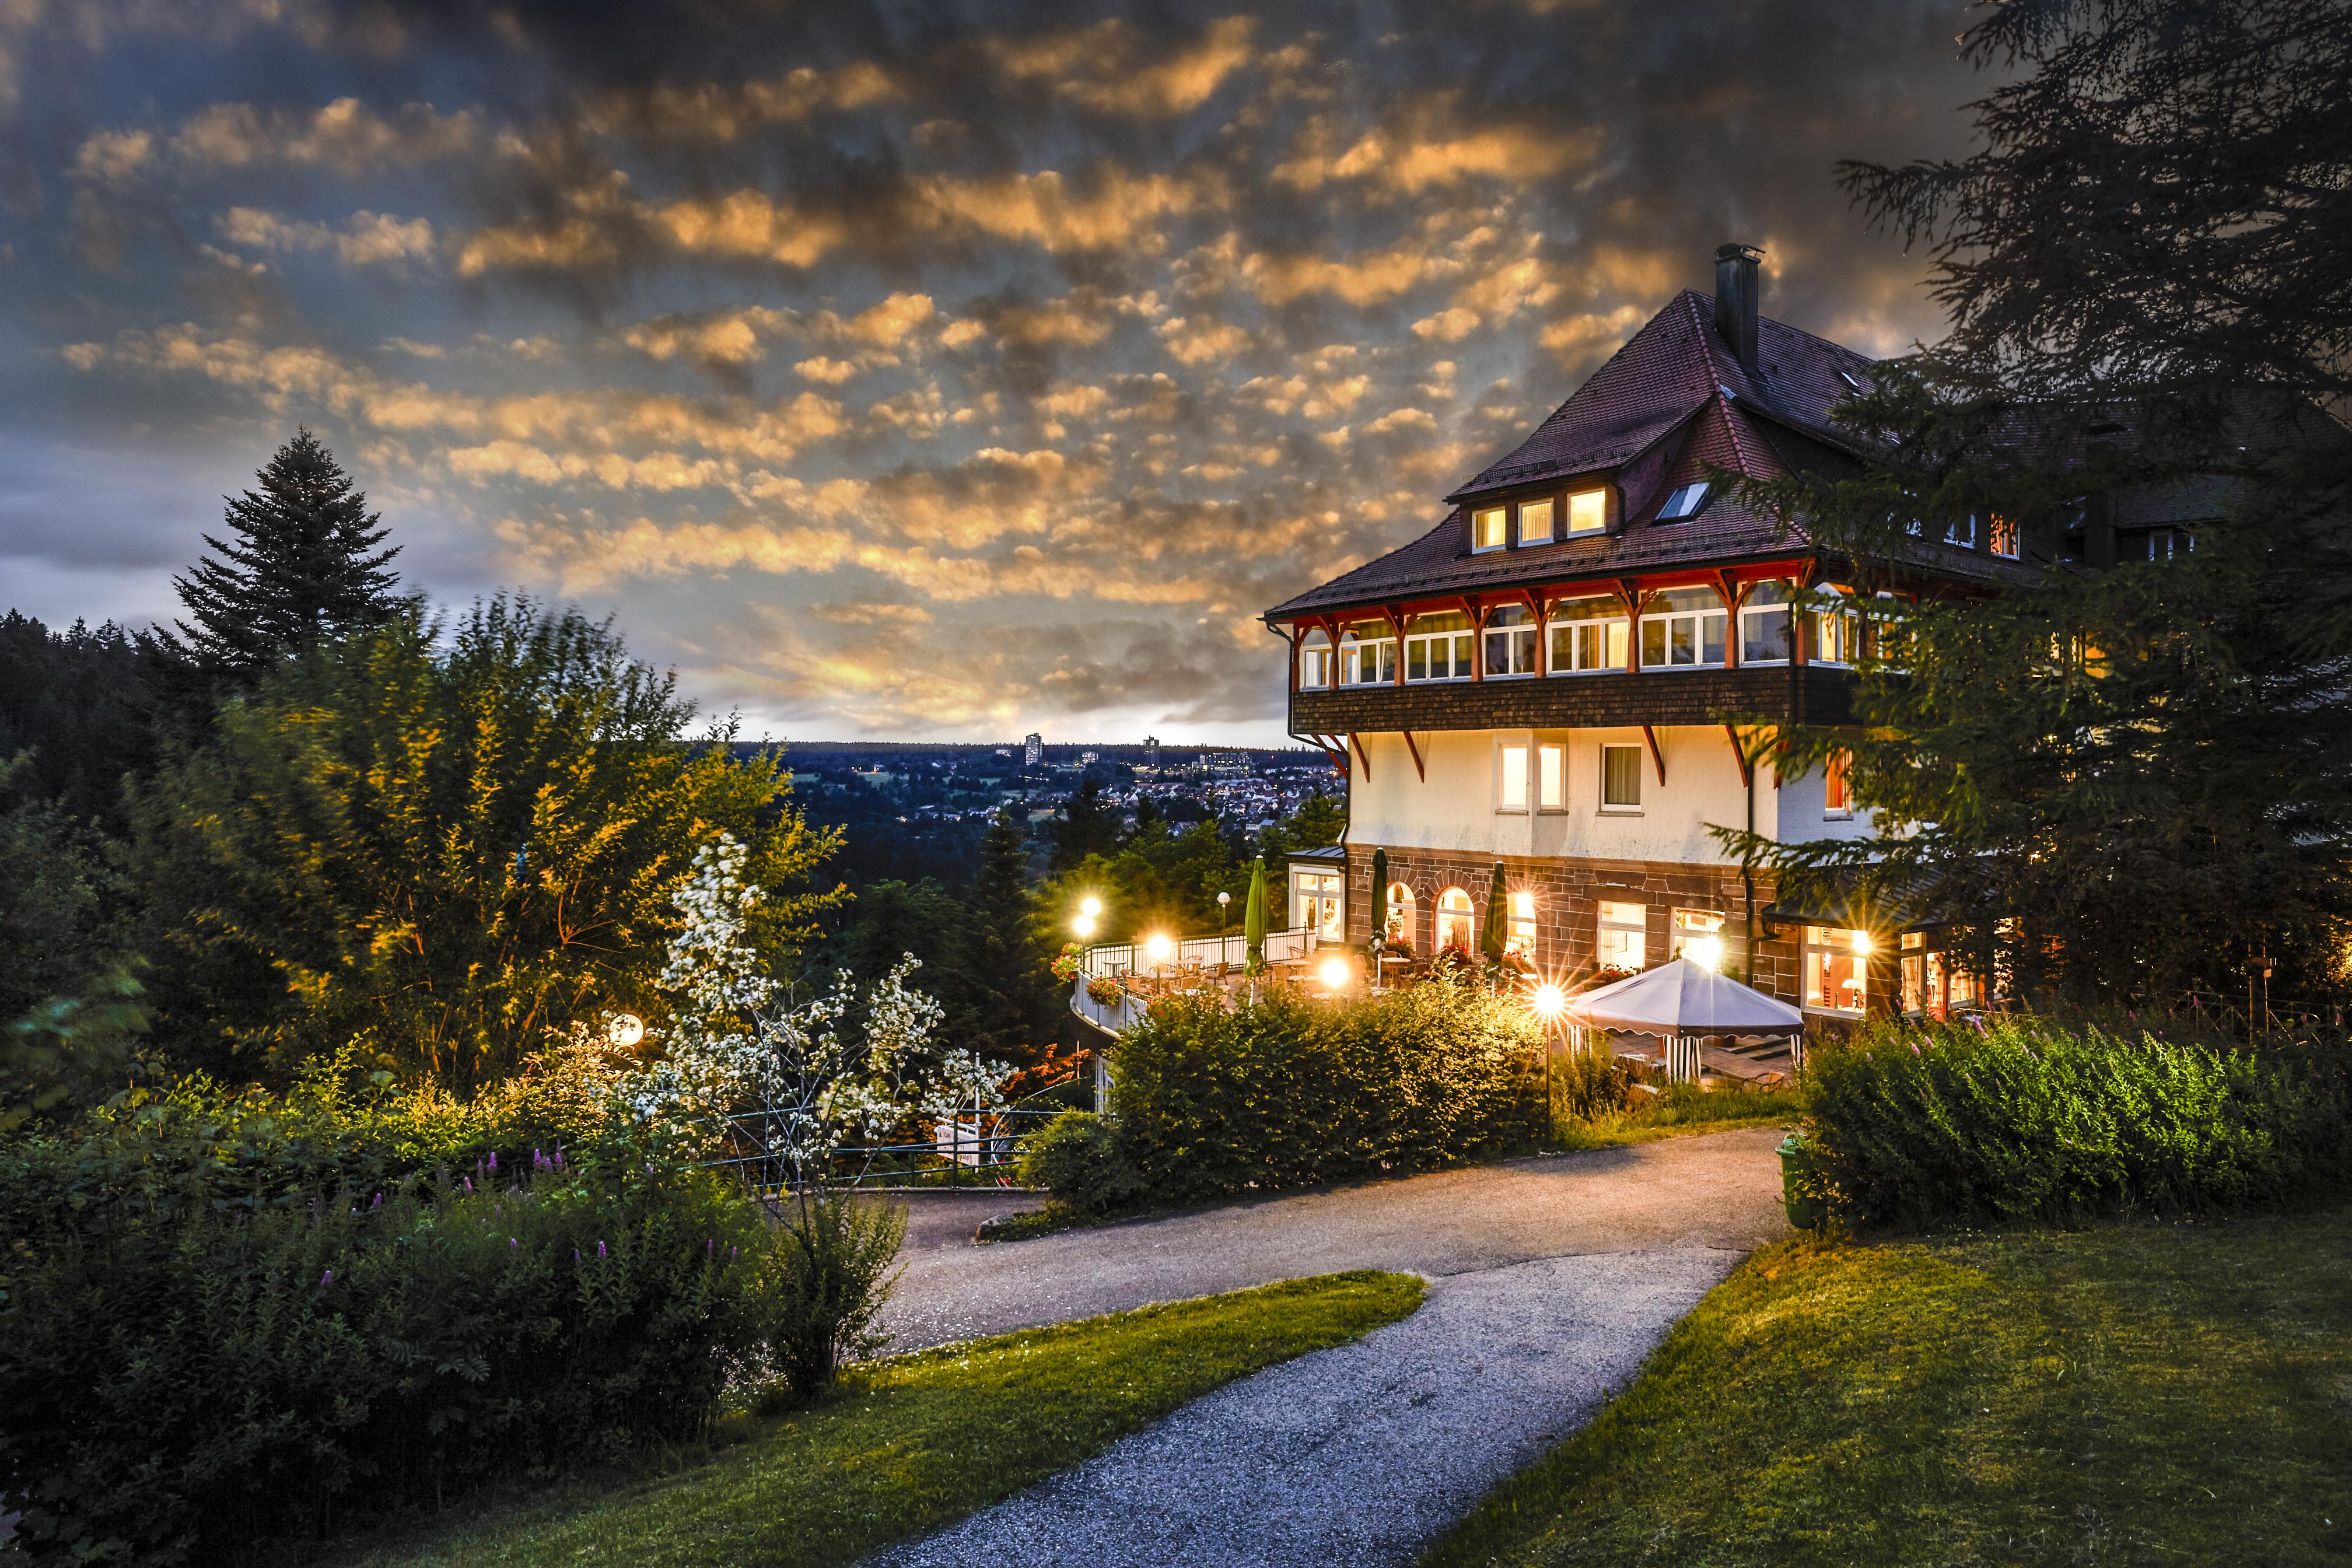 hotel teuchelwald in freudenstadt holidaycheck baden w rttemberg deutschland. Black Bedroom Furniture Sets. Home Design Ideas